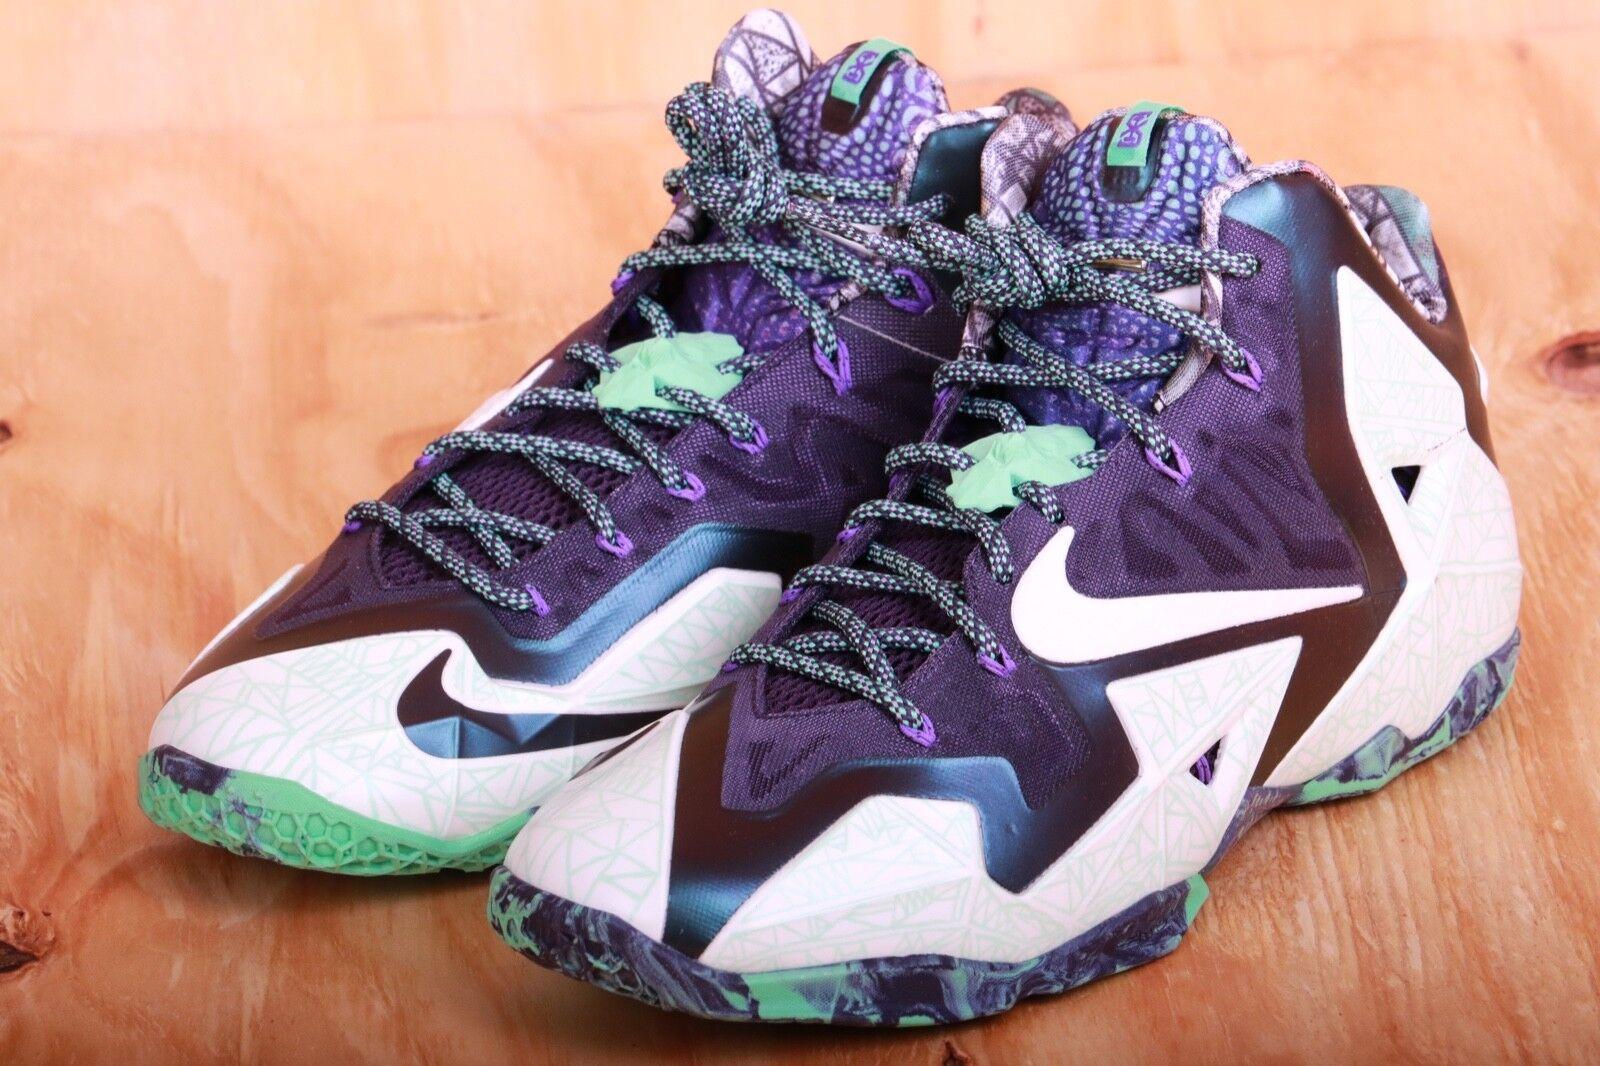 6b083dfc8617 Nike Lebron Xi-as Gator King ASG 2014 Nola Cashmere Green Glow ...